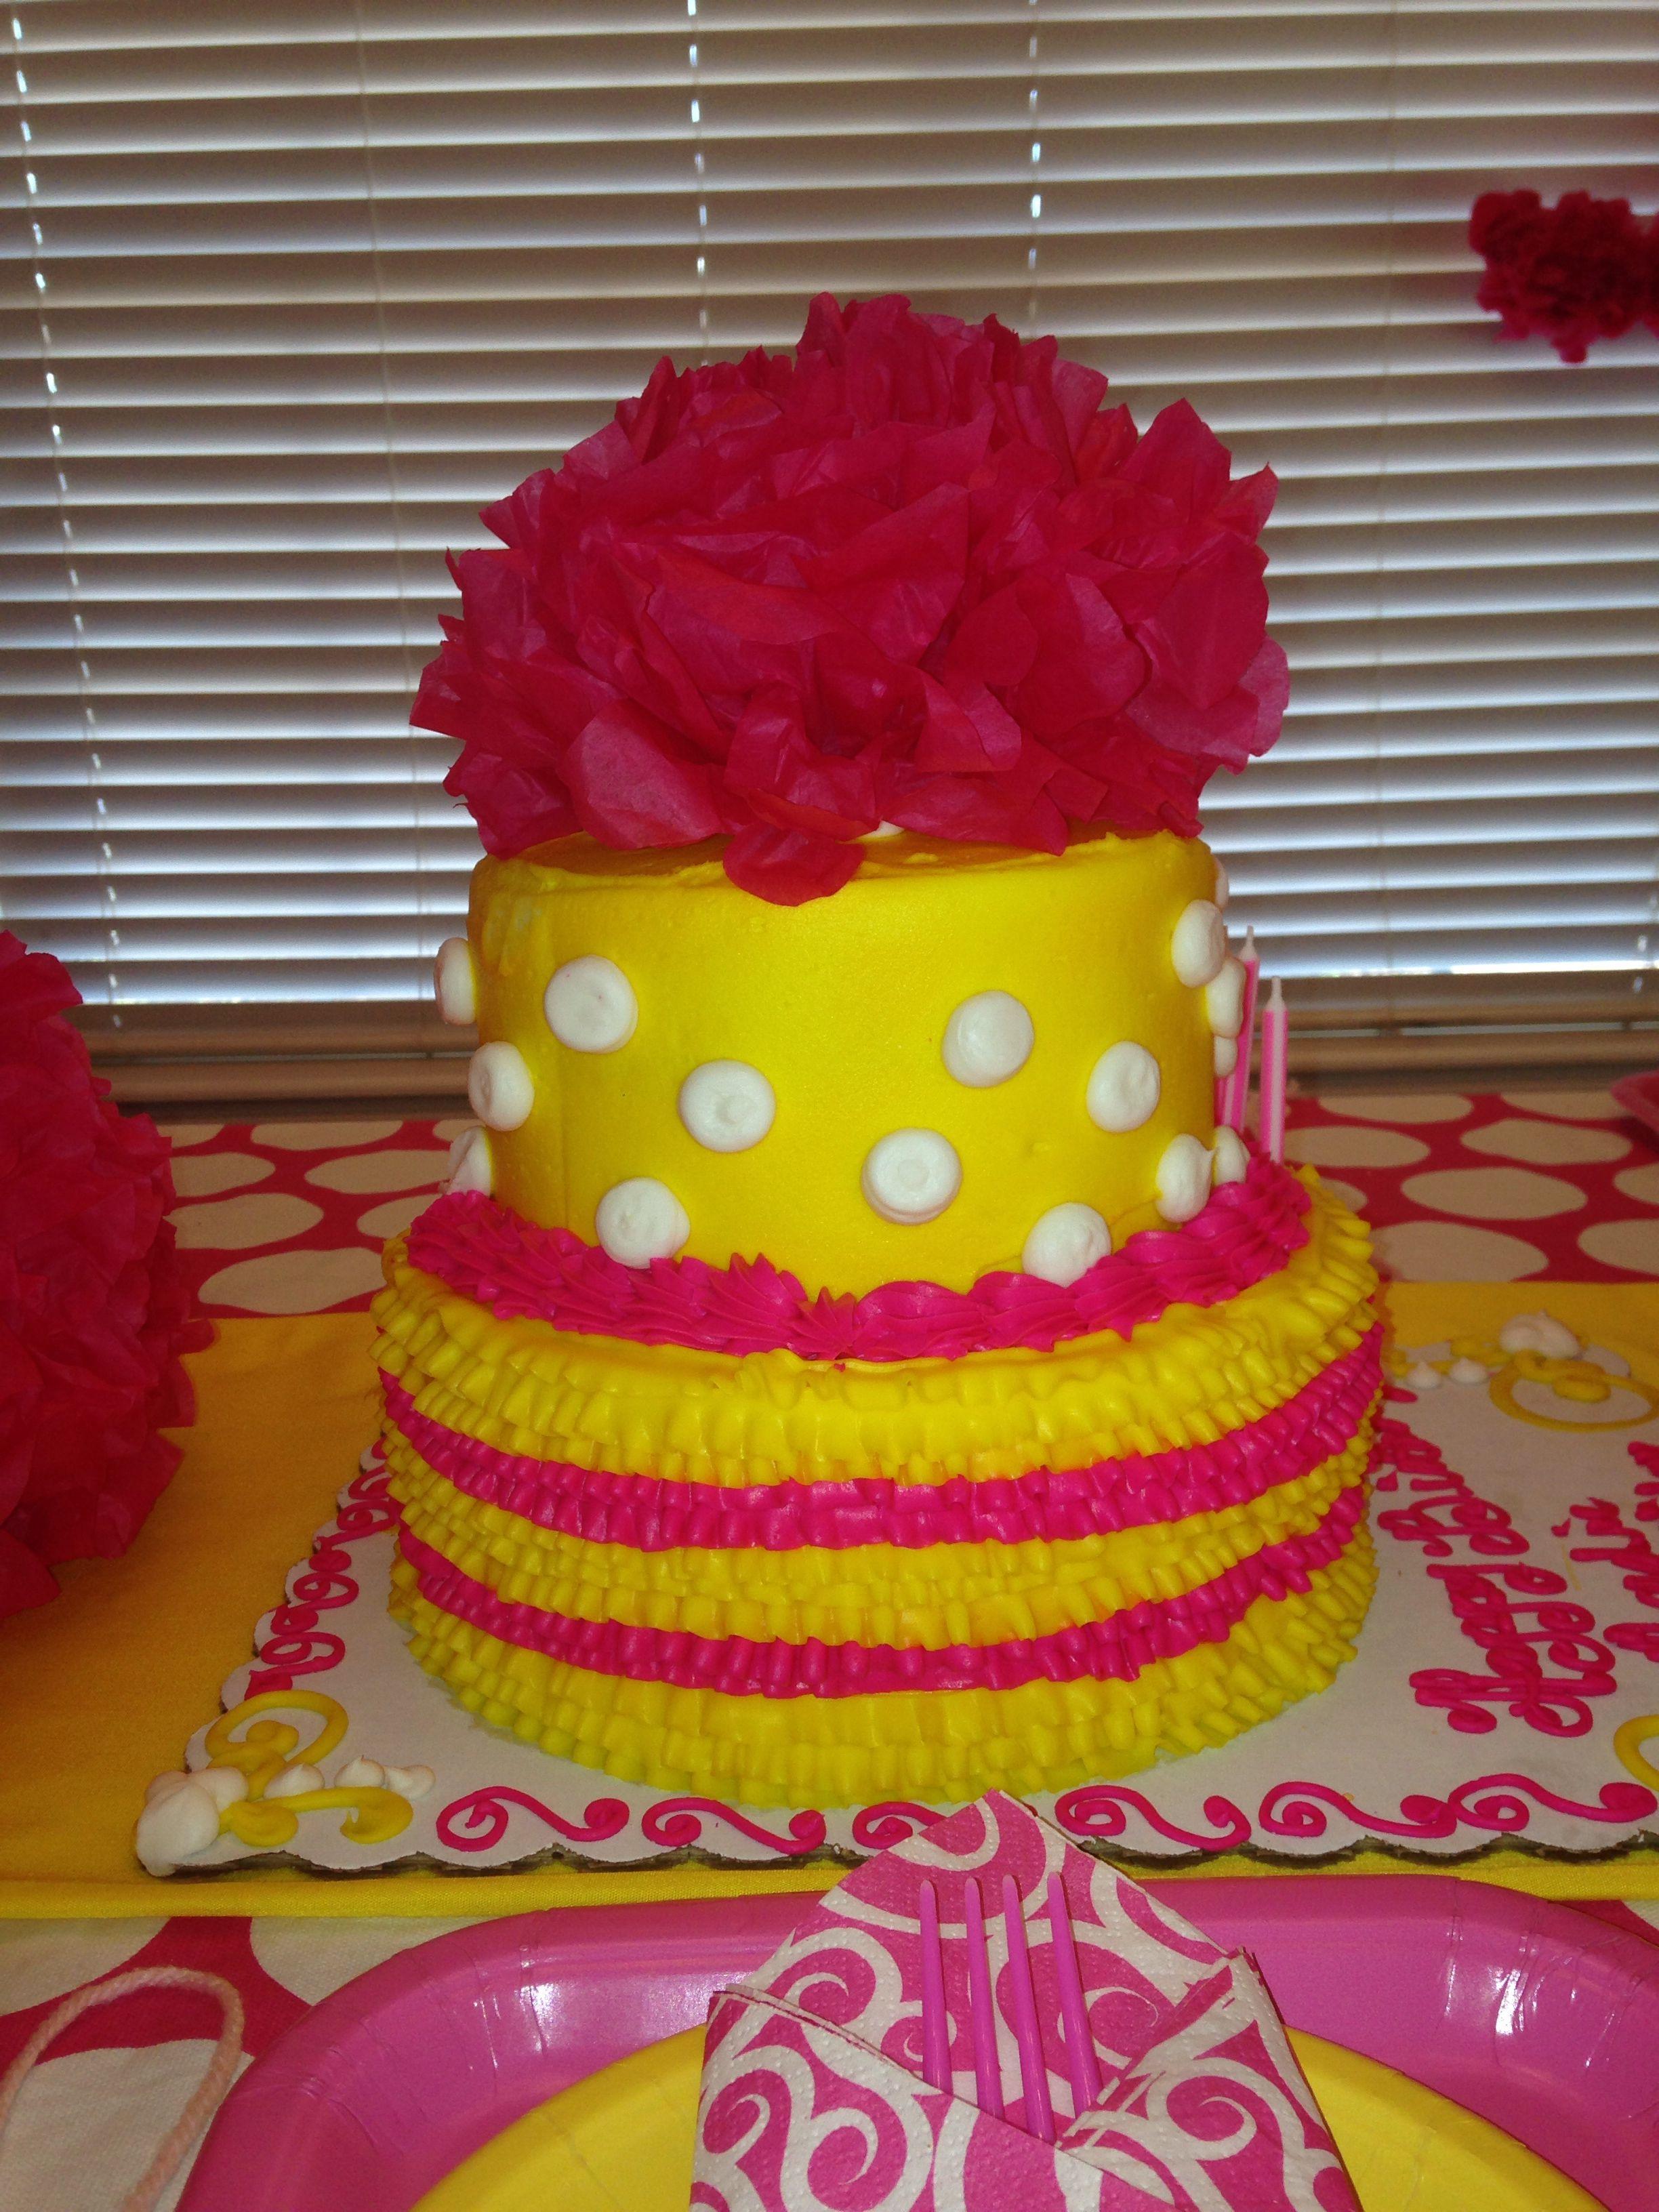 Sensational Pink And Yellow Birthday Cake Yellow Birthday Cakes Sunshine Funny Birthday Cards Online Ioscodamsfinfo